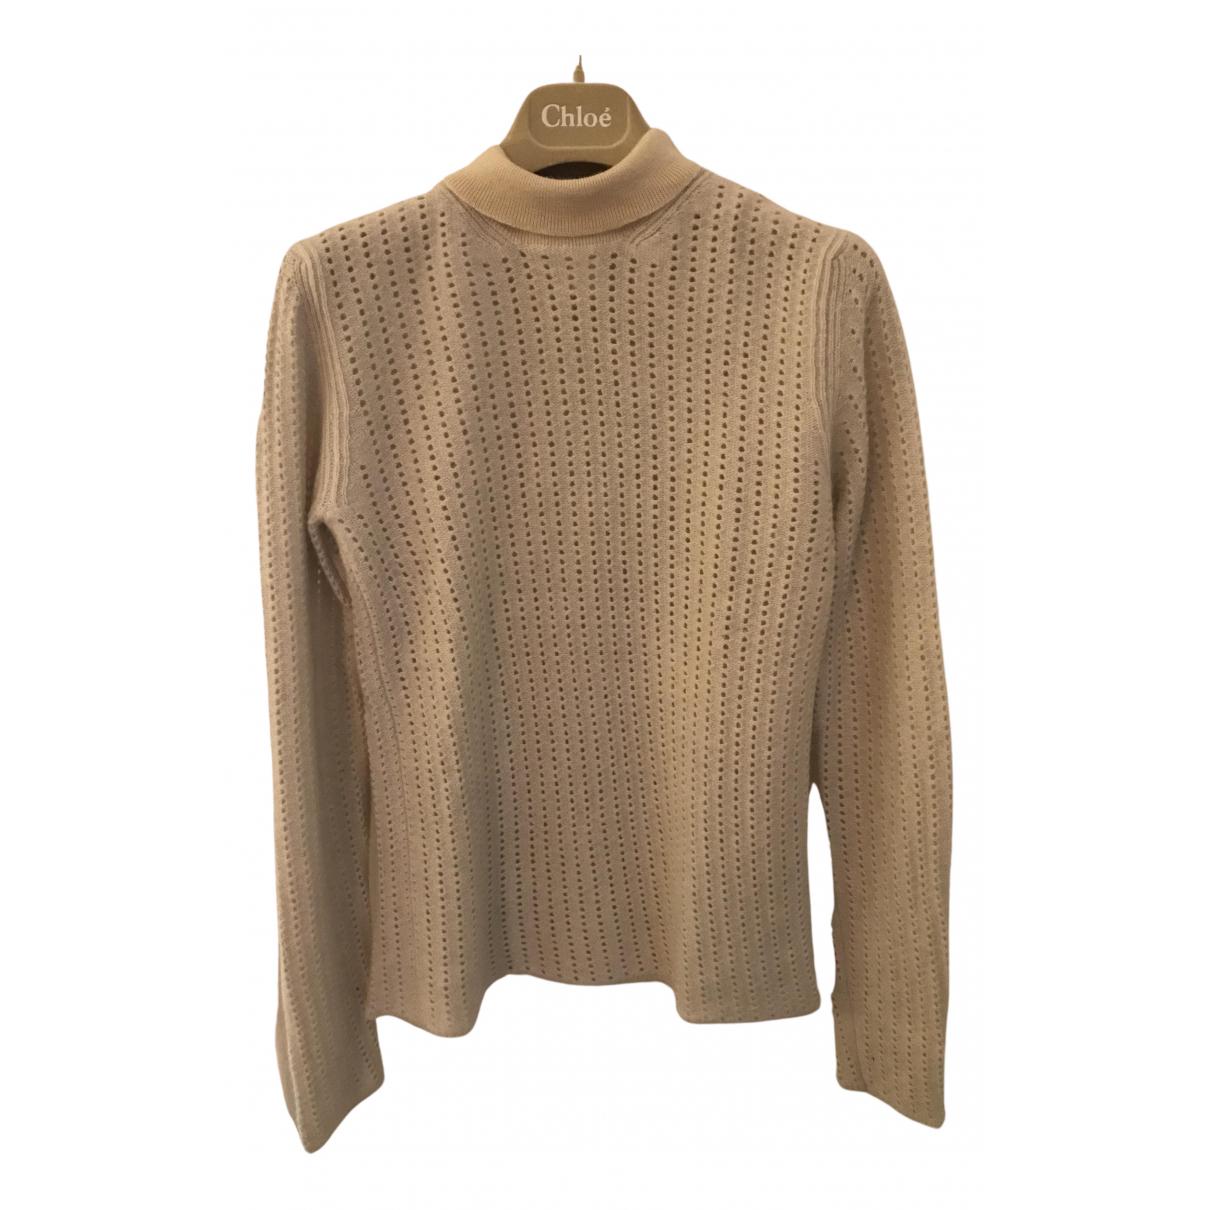 Chloe - Pull   pour femme en laine - beige